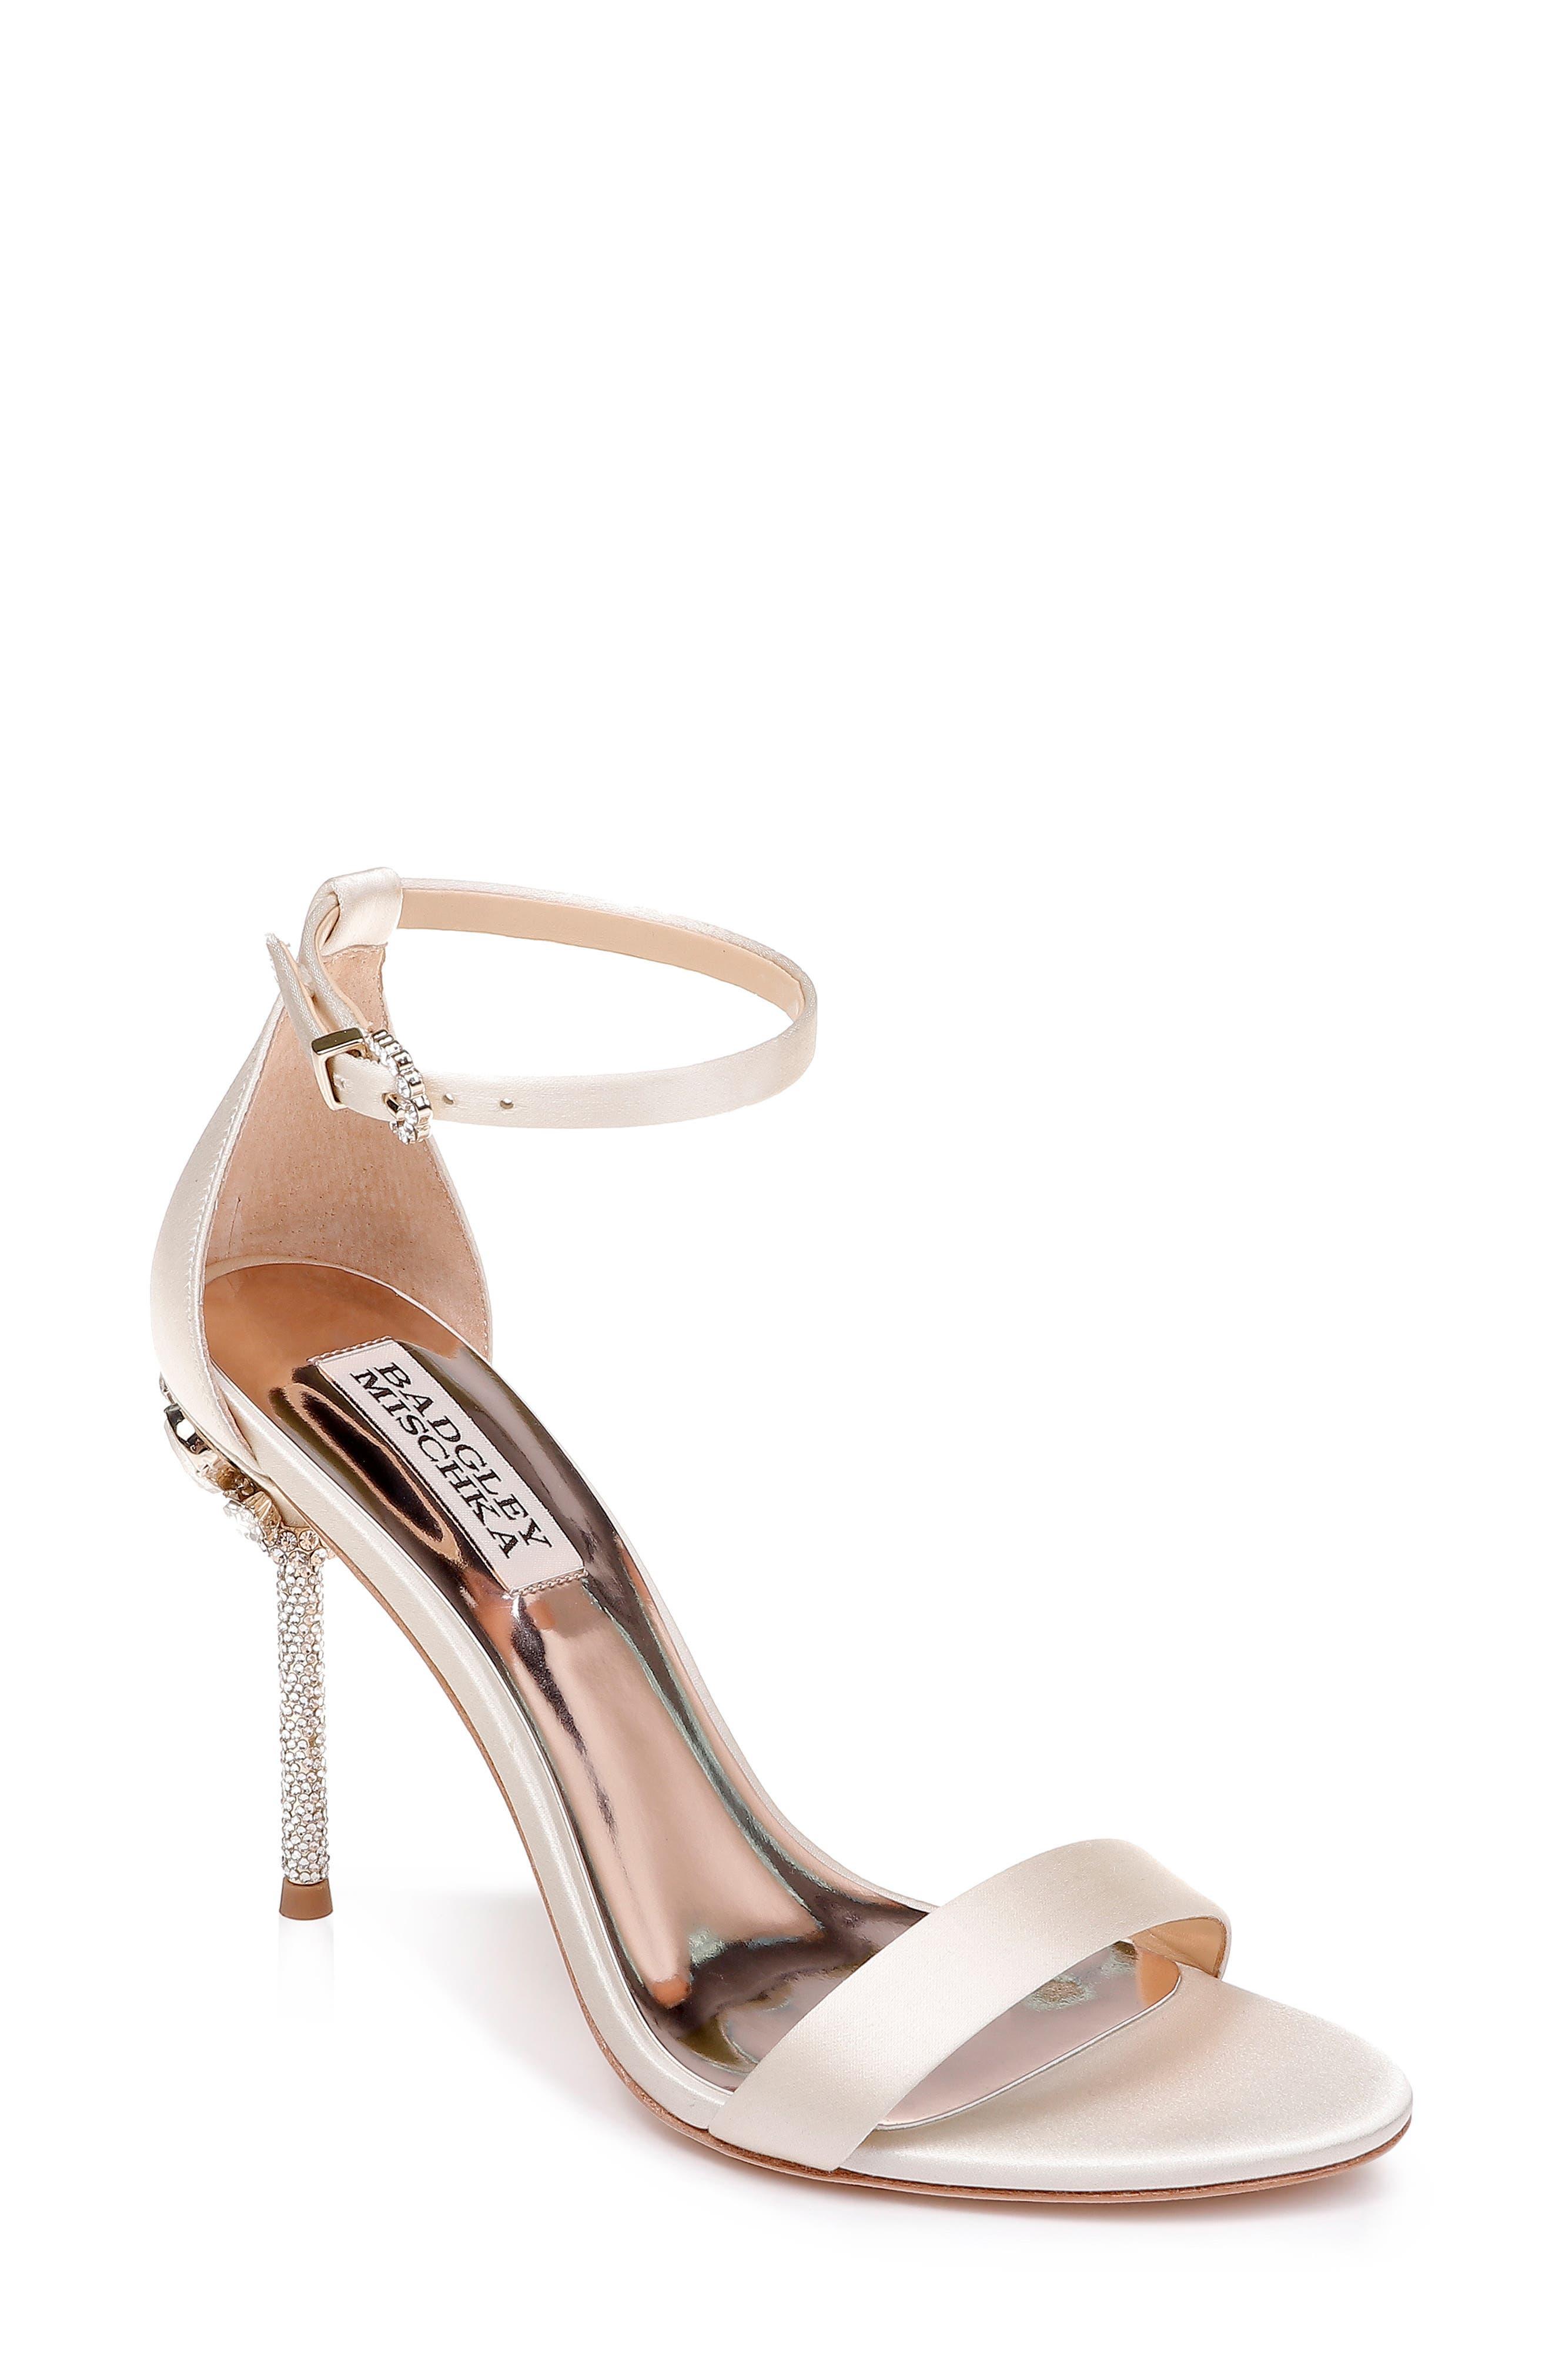 Badgley Mischka Vicia Crystal Embellished Heel Sandal, Ivory